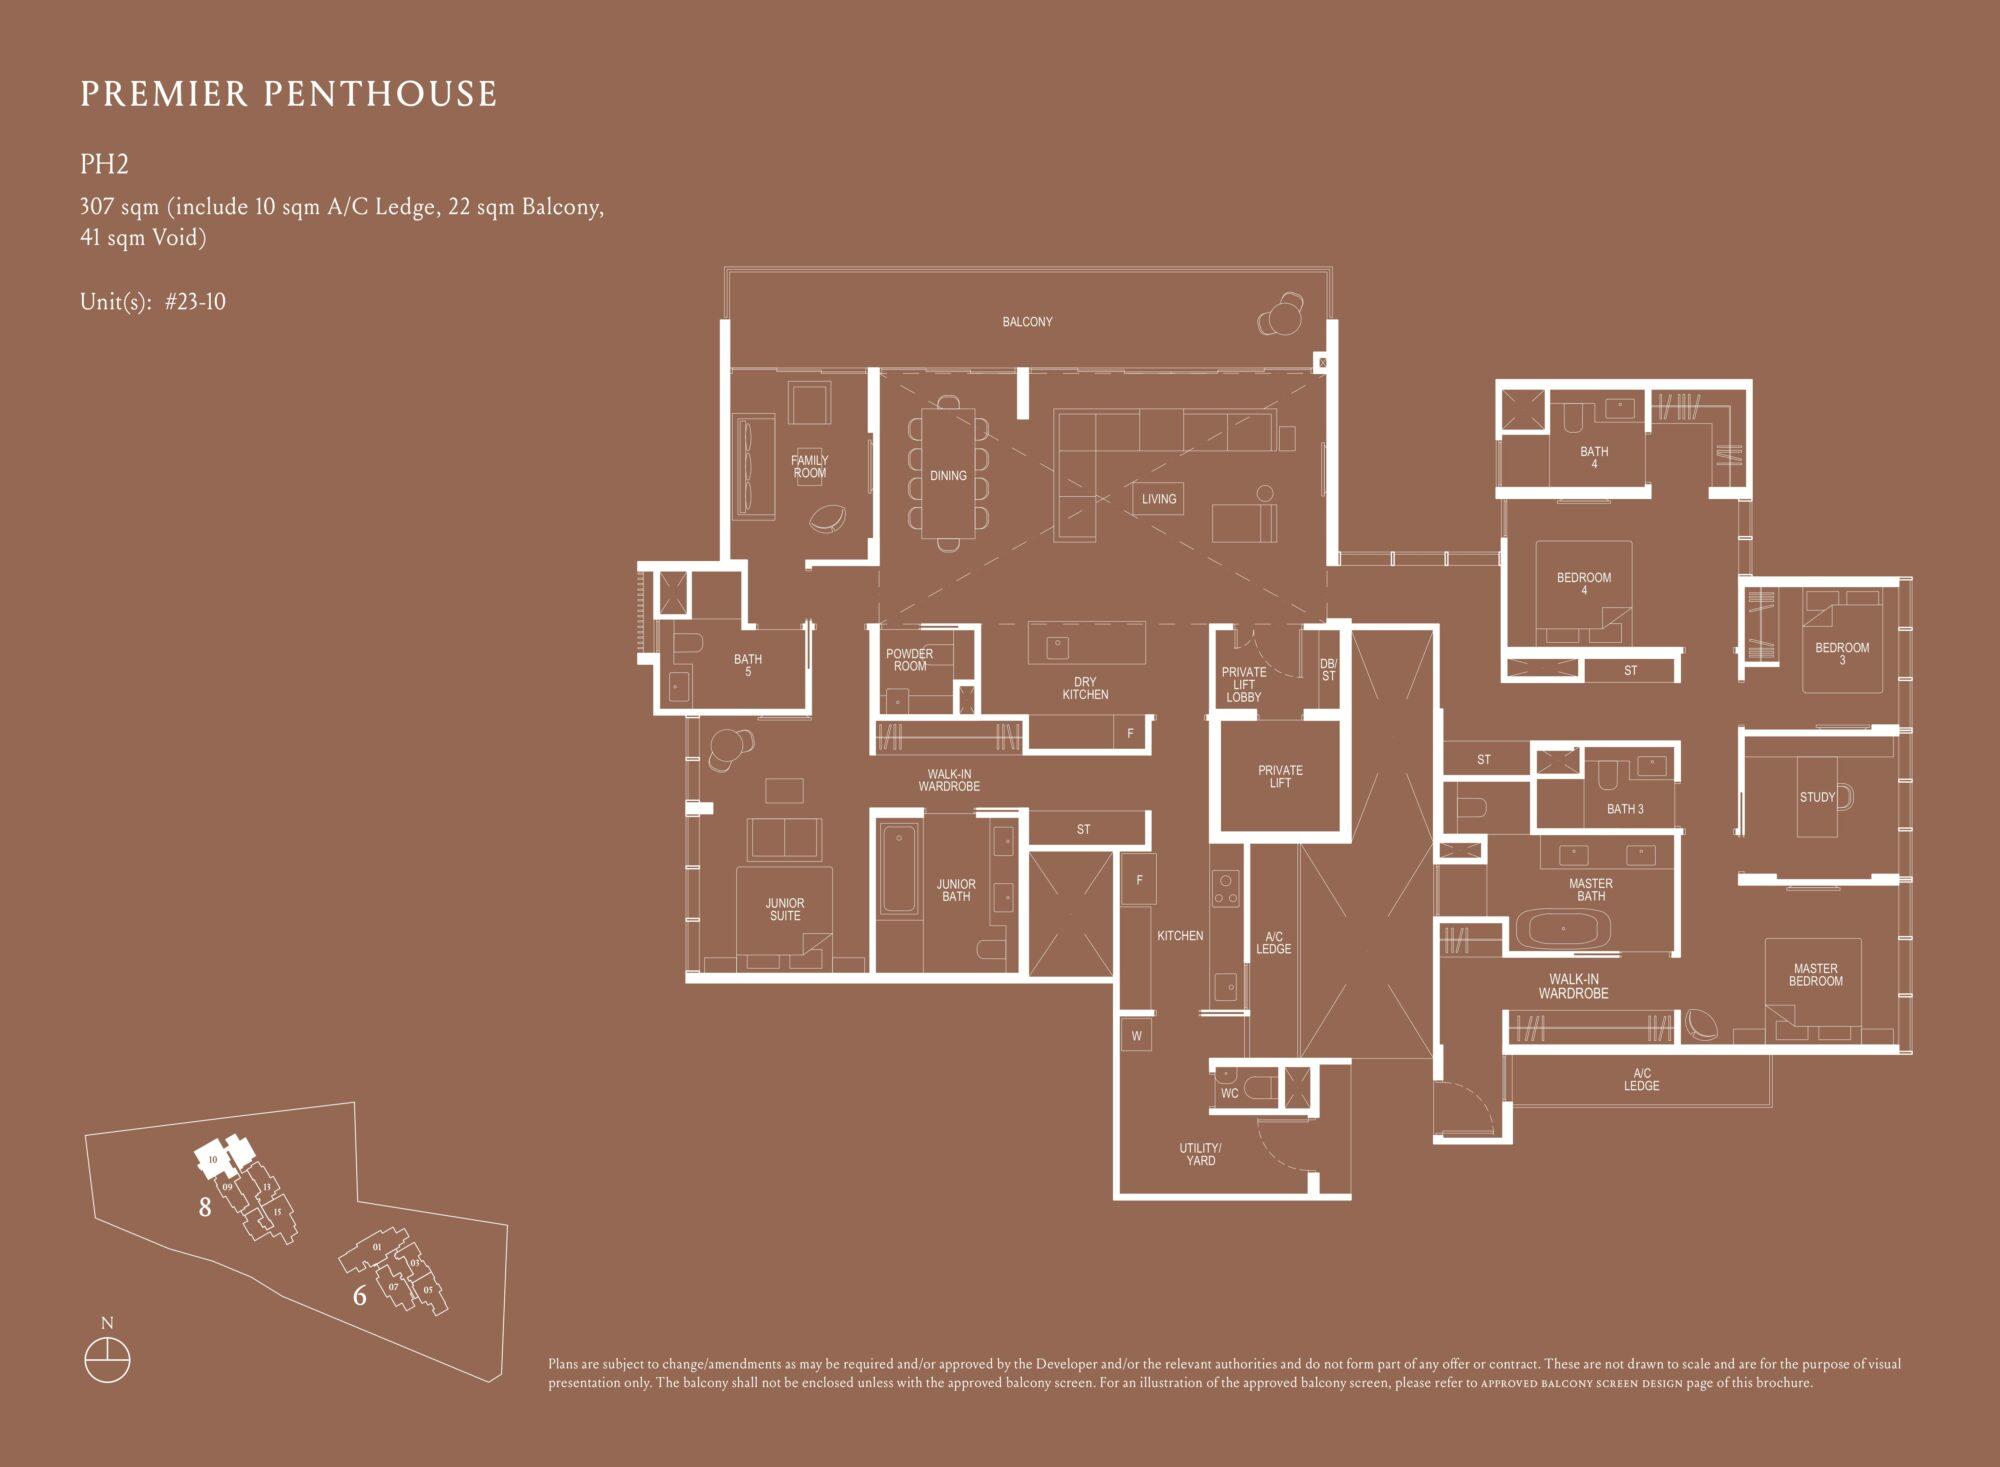 Kopar At Newton 纽顿铜源 premier penthouse 307 sqm PH2 floor plan